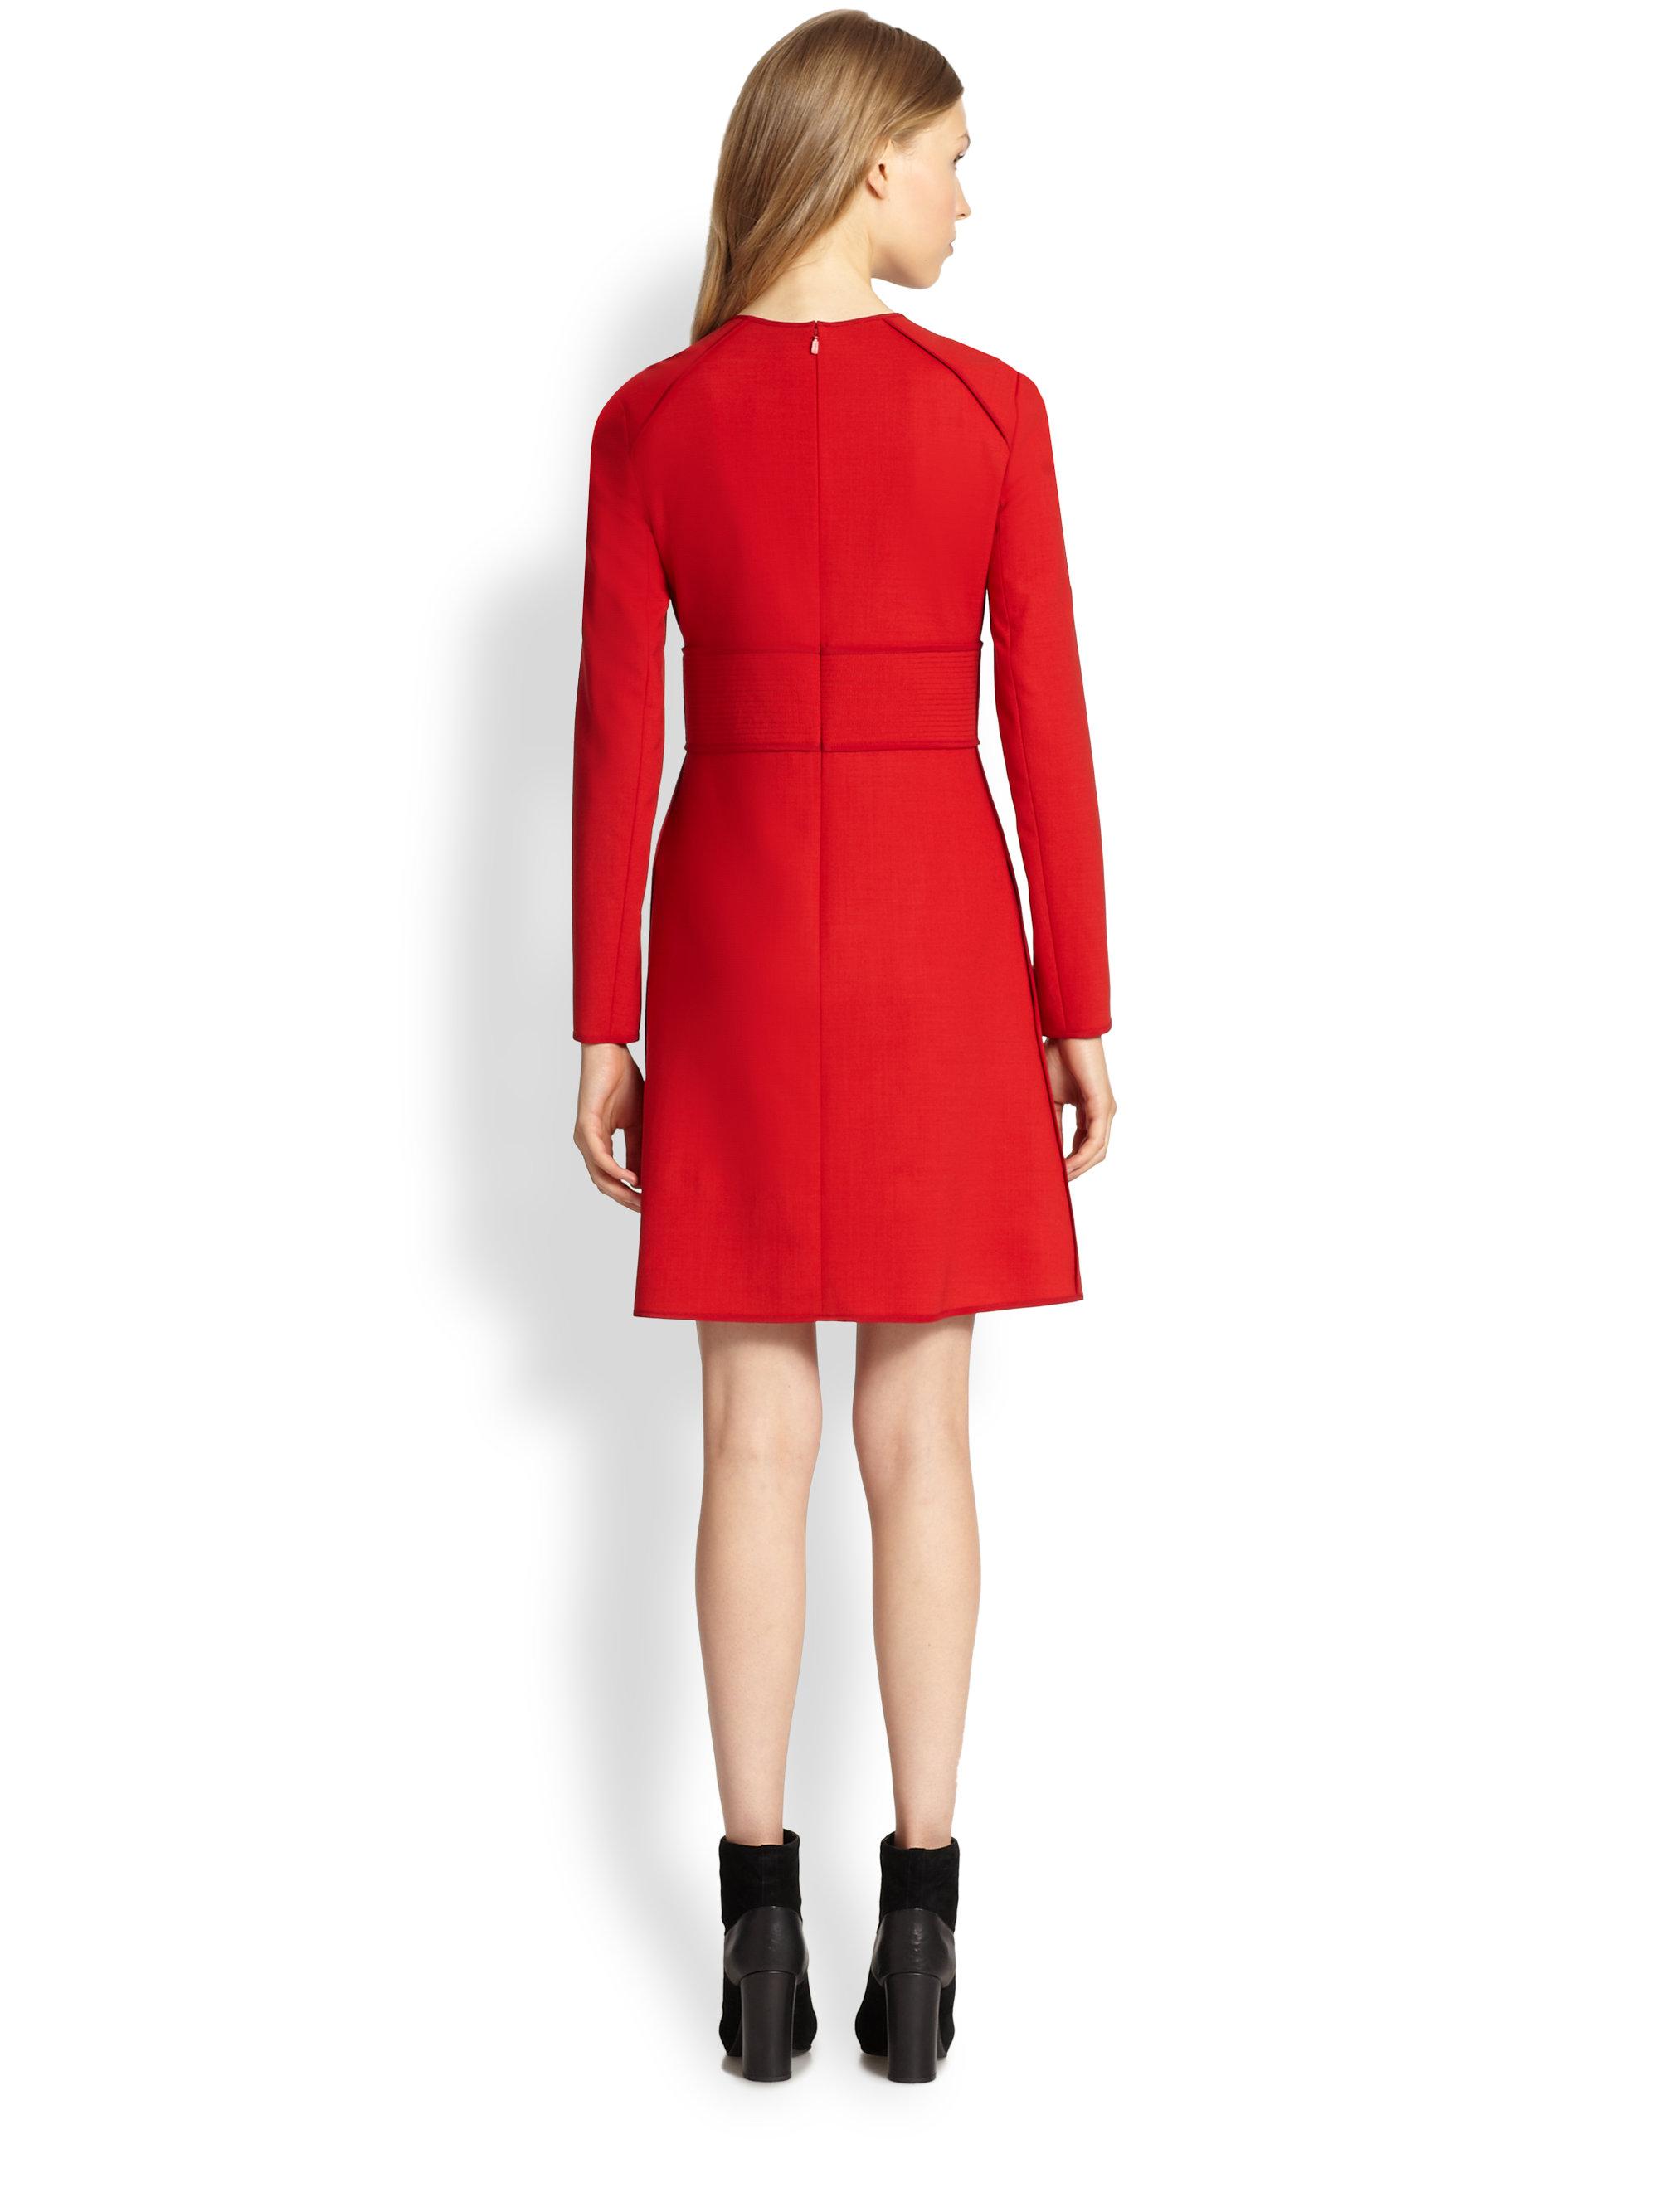 Red dress wool photos